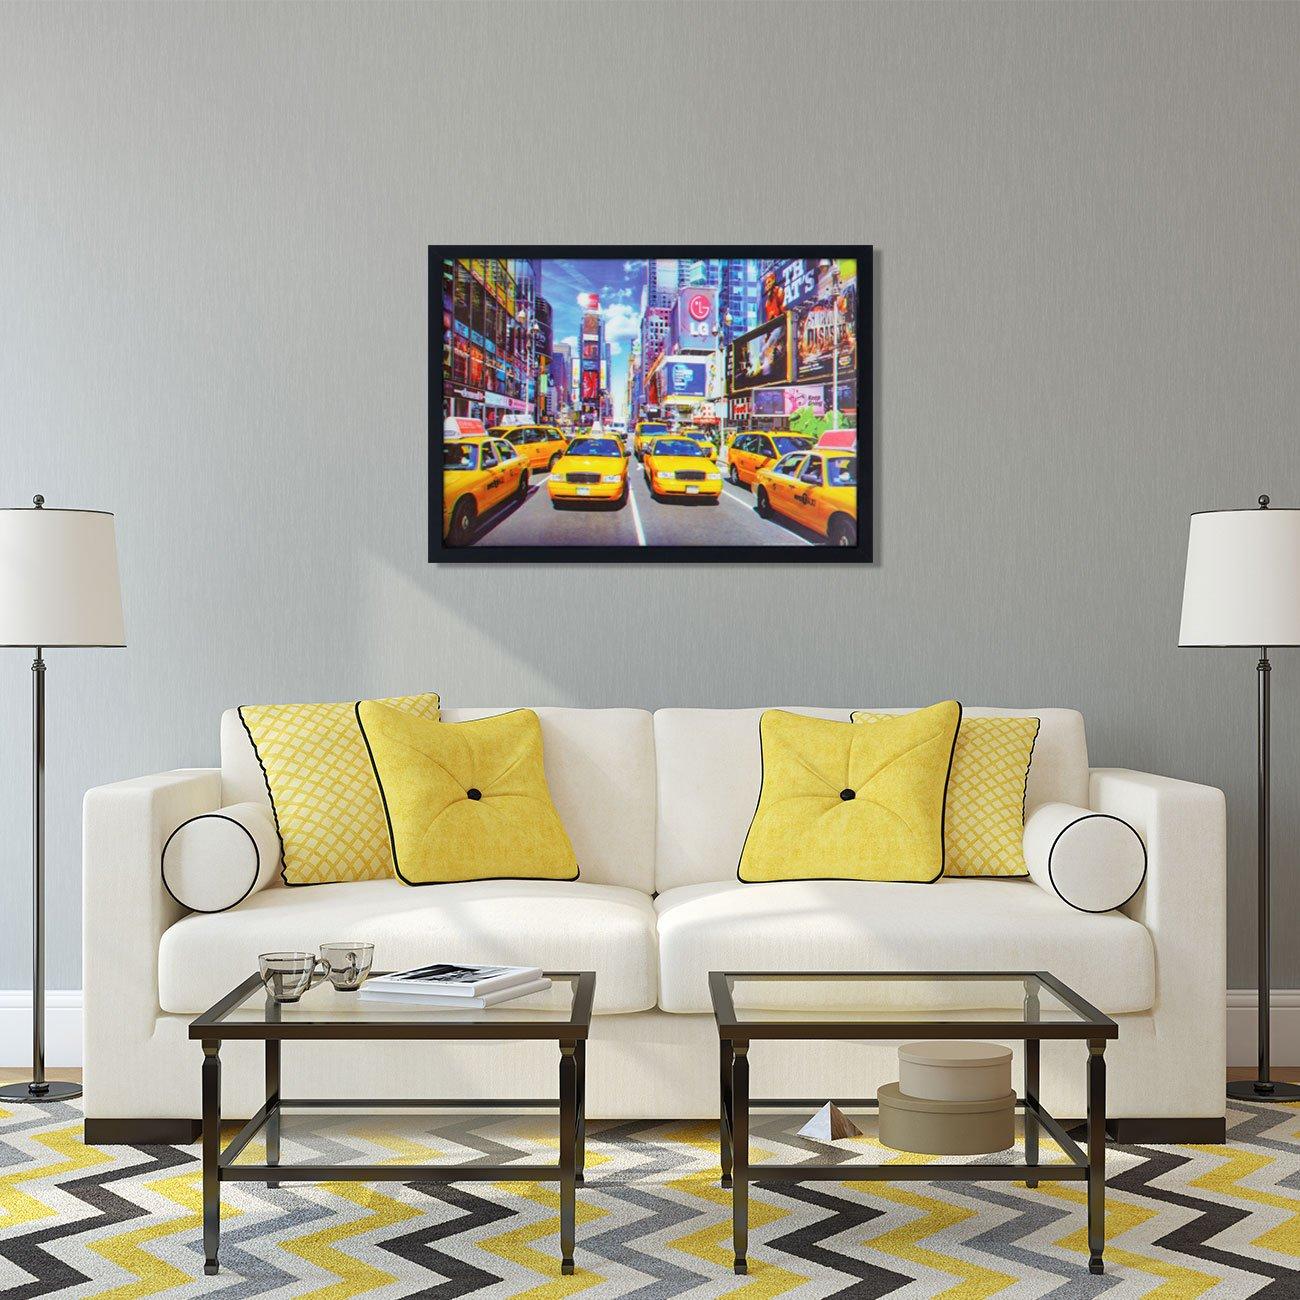 Quadro Decorativo Poster 3D Táxis Amarelos de Nova York 70x50cm